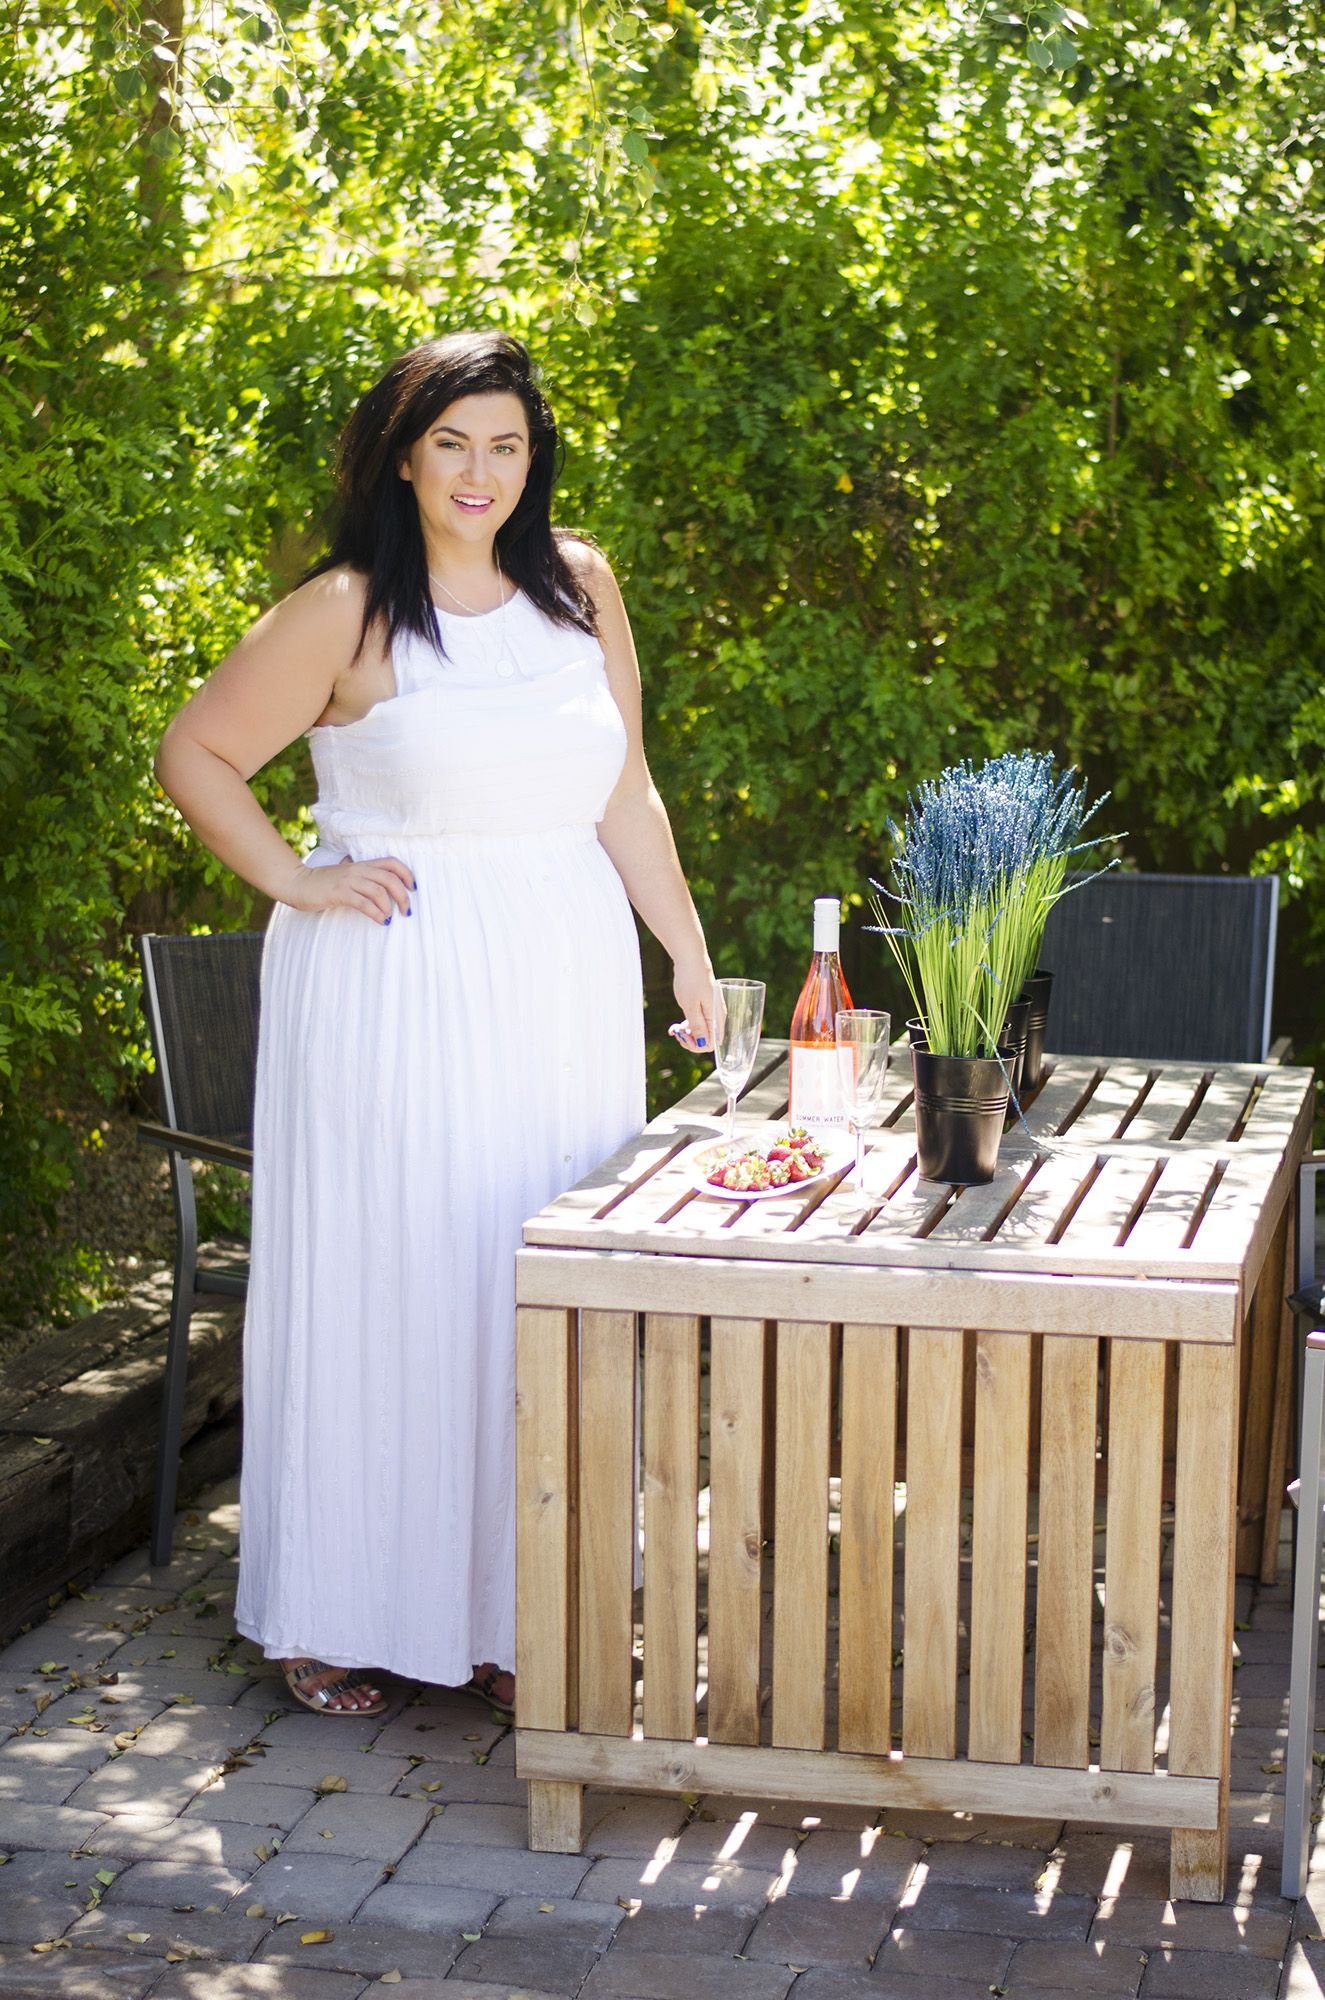 Dress Plus Size White Dress Home Cocktail Hour Date Night At Home Kohls Plus Size Dress Home White Dress Plus Size [ 2000 x 1325 Pixel ]